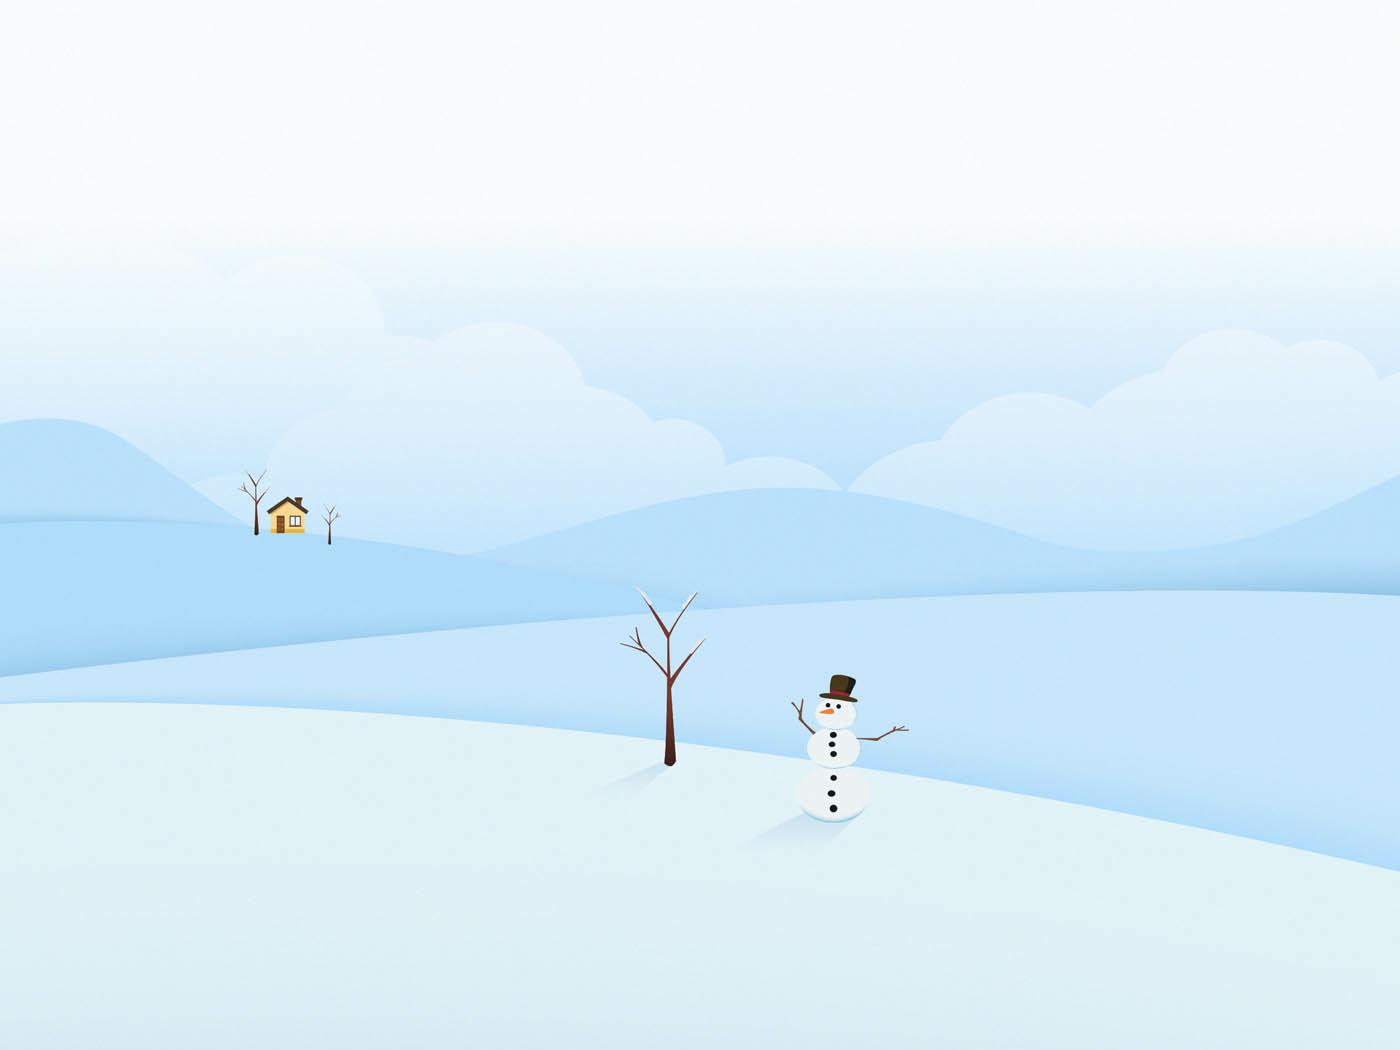 December winter is coming lublin industi illustration winter month card callendar december